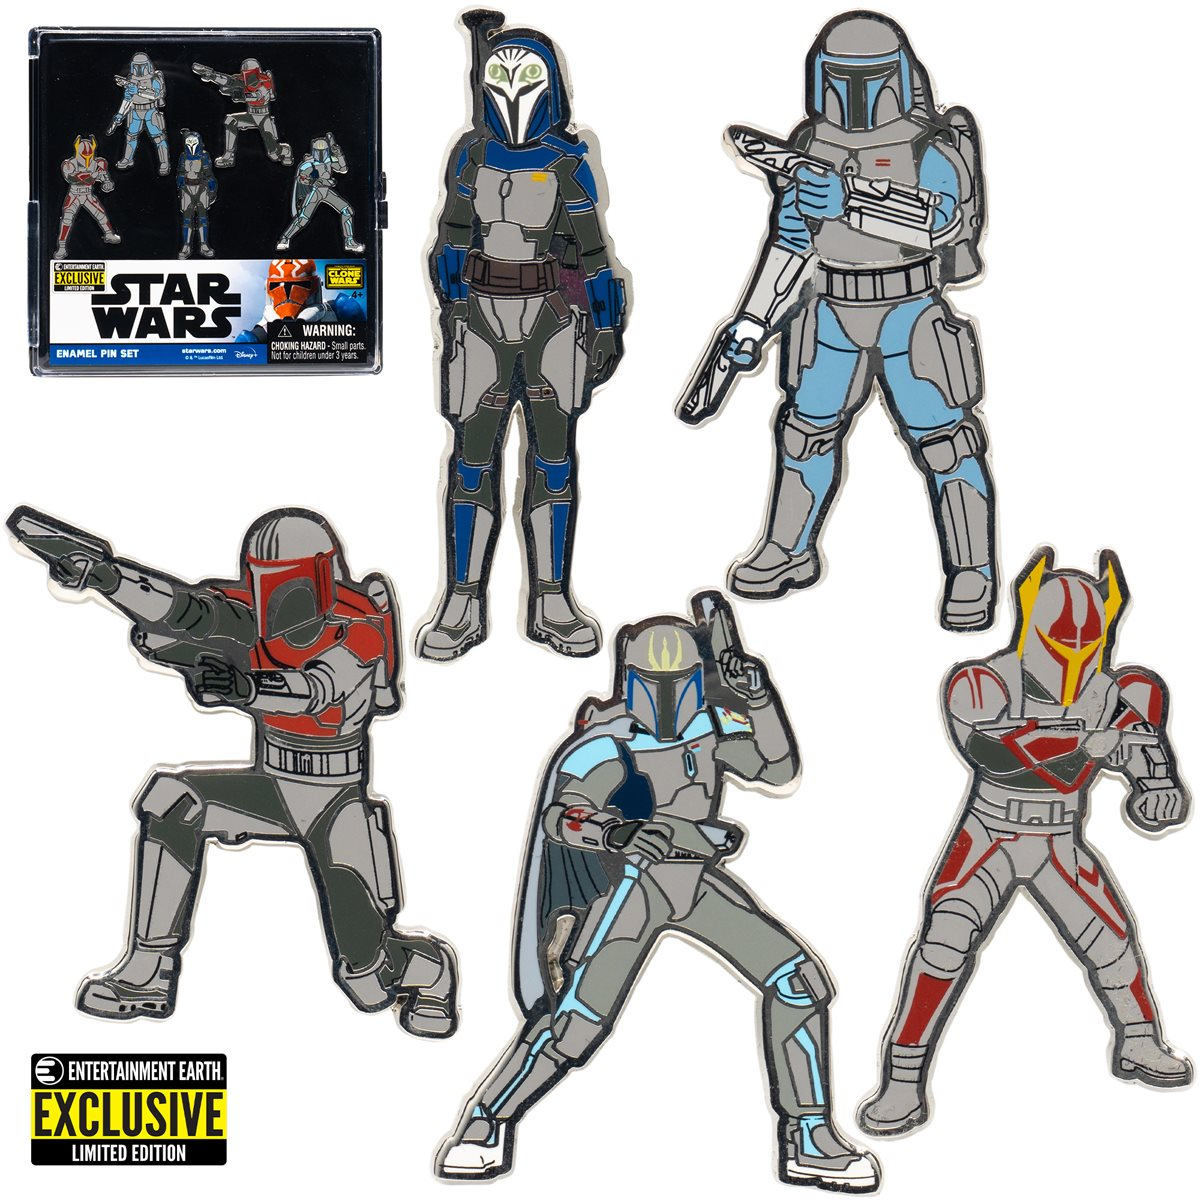 Star Wars Mandalorians Enamel Pin 5-Pack画像